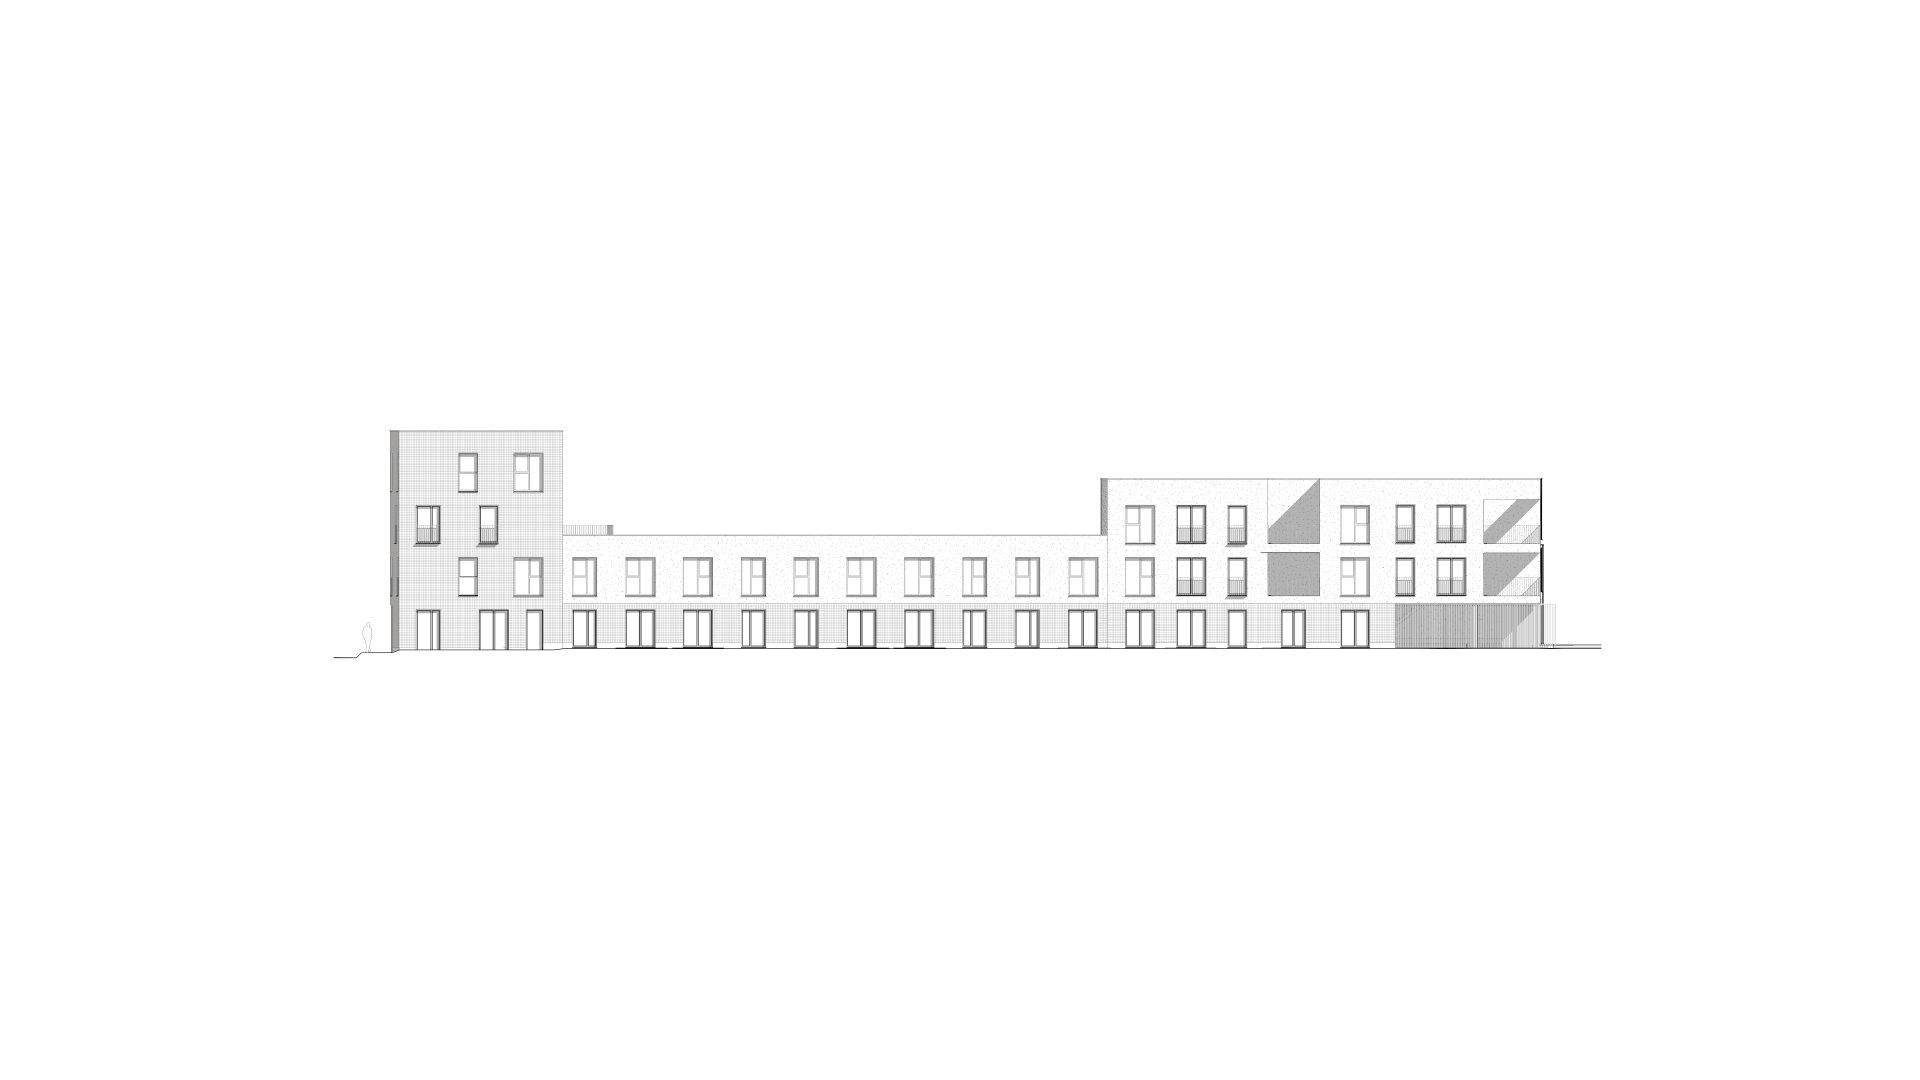 Rauter, collectieve woningen, Anderlecht-70248882